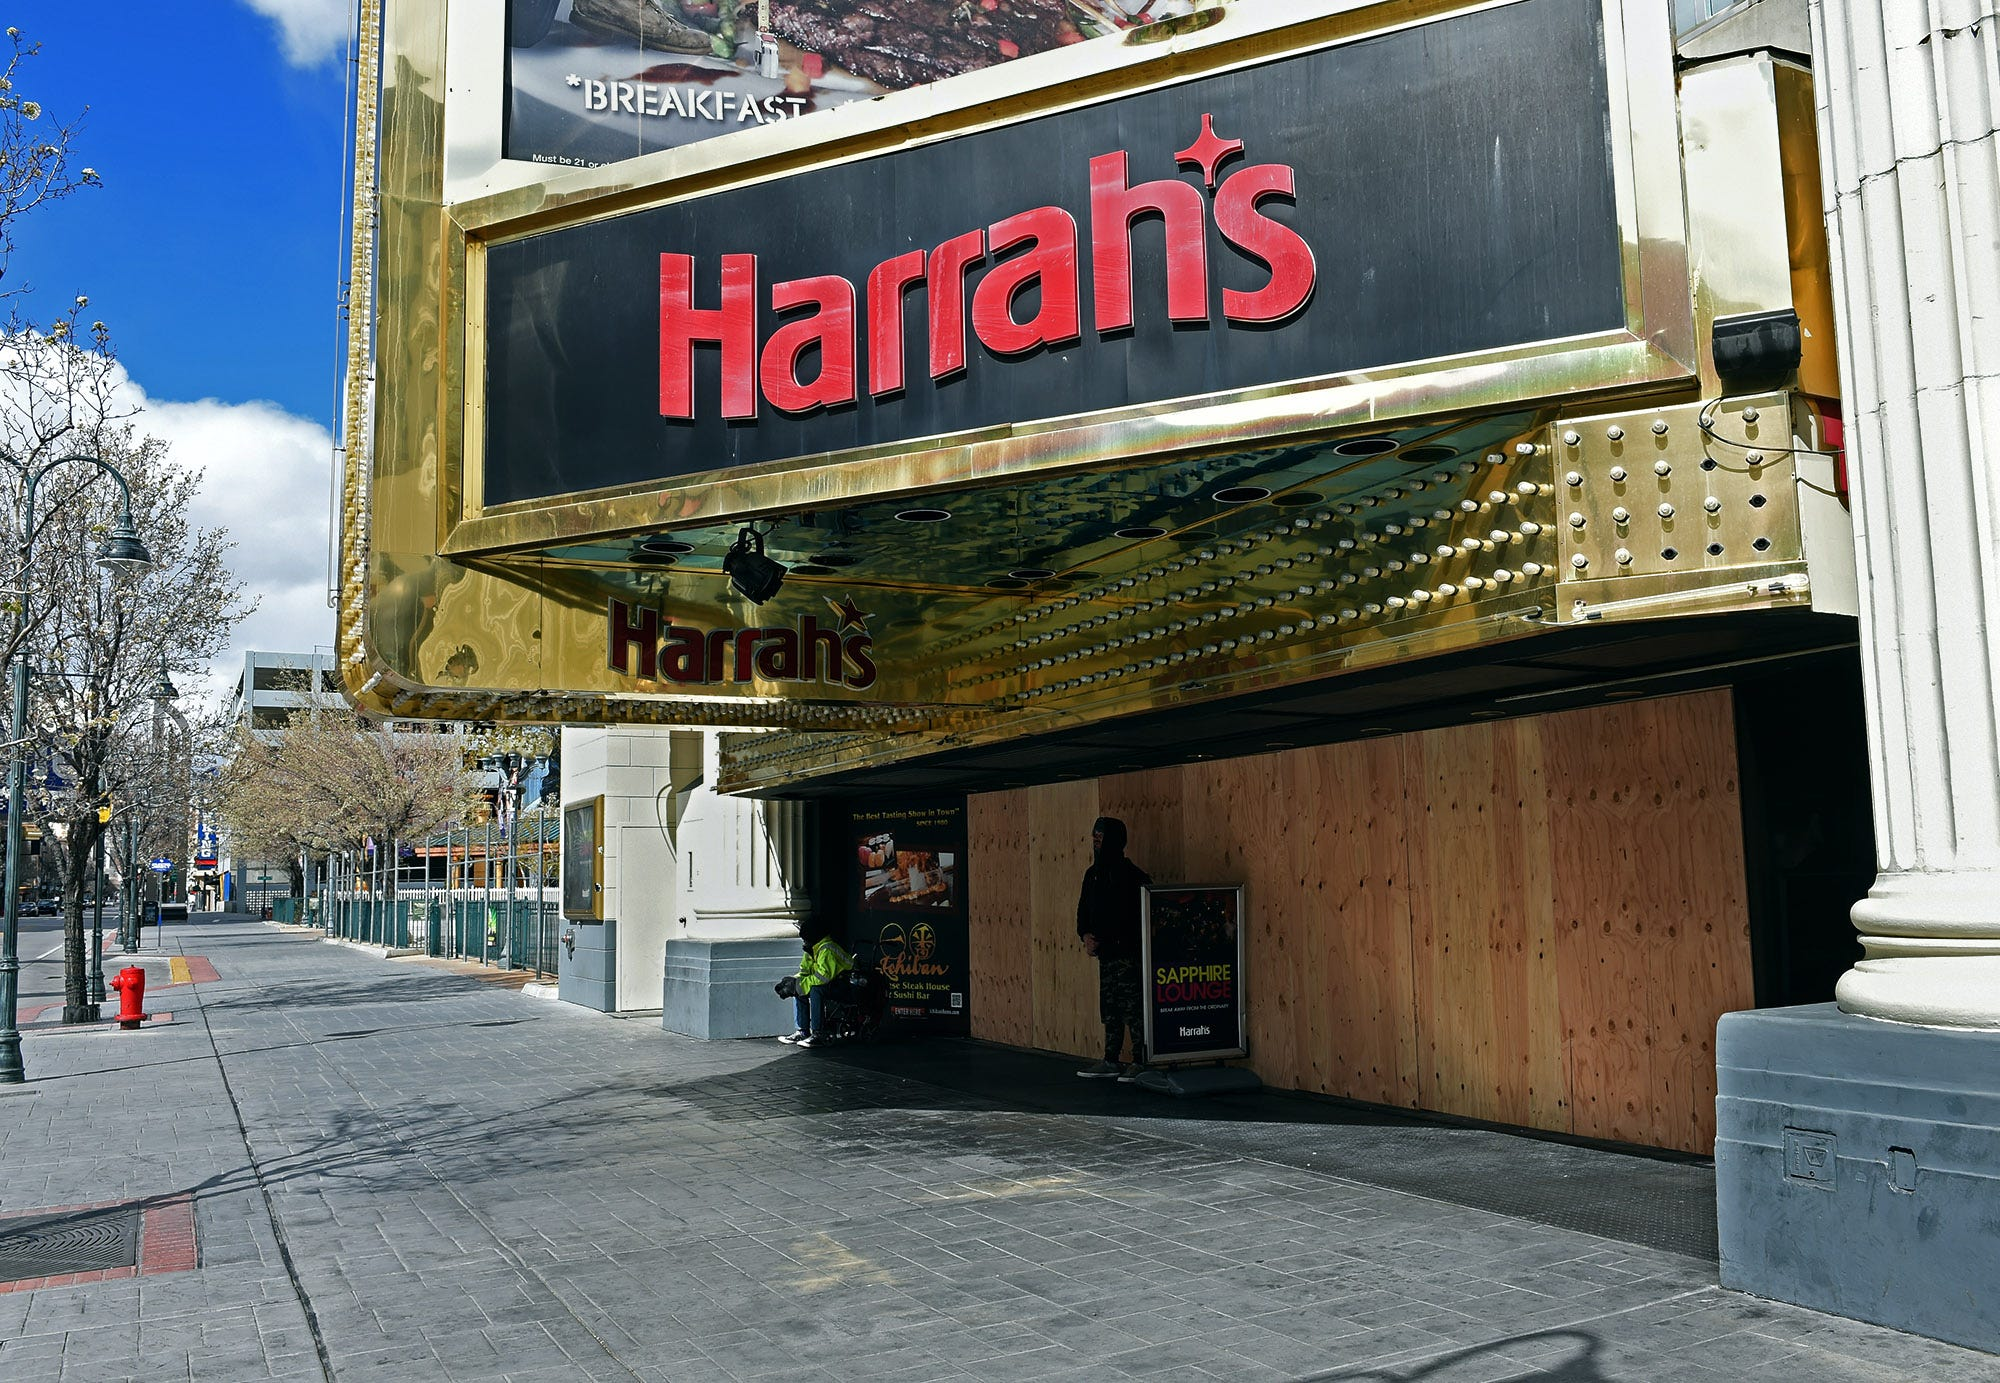 Casino harrahs nv reno free online slots free spins no registration